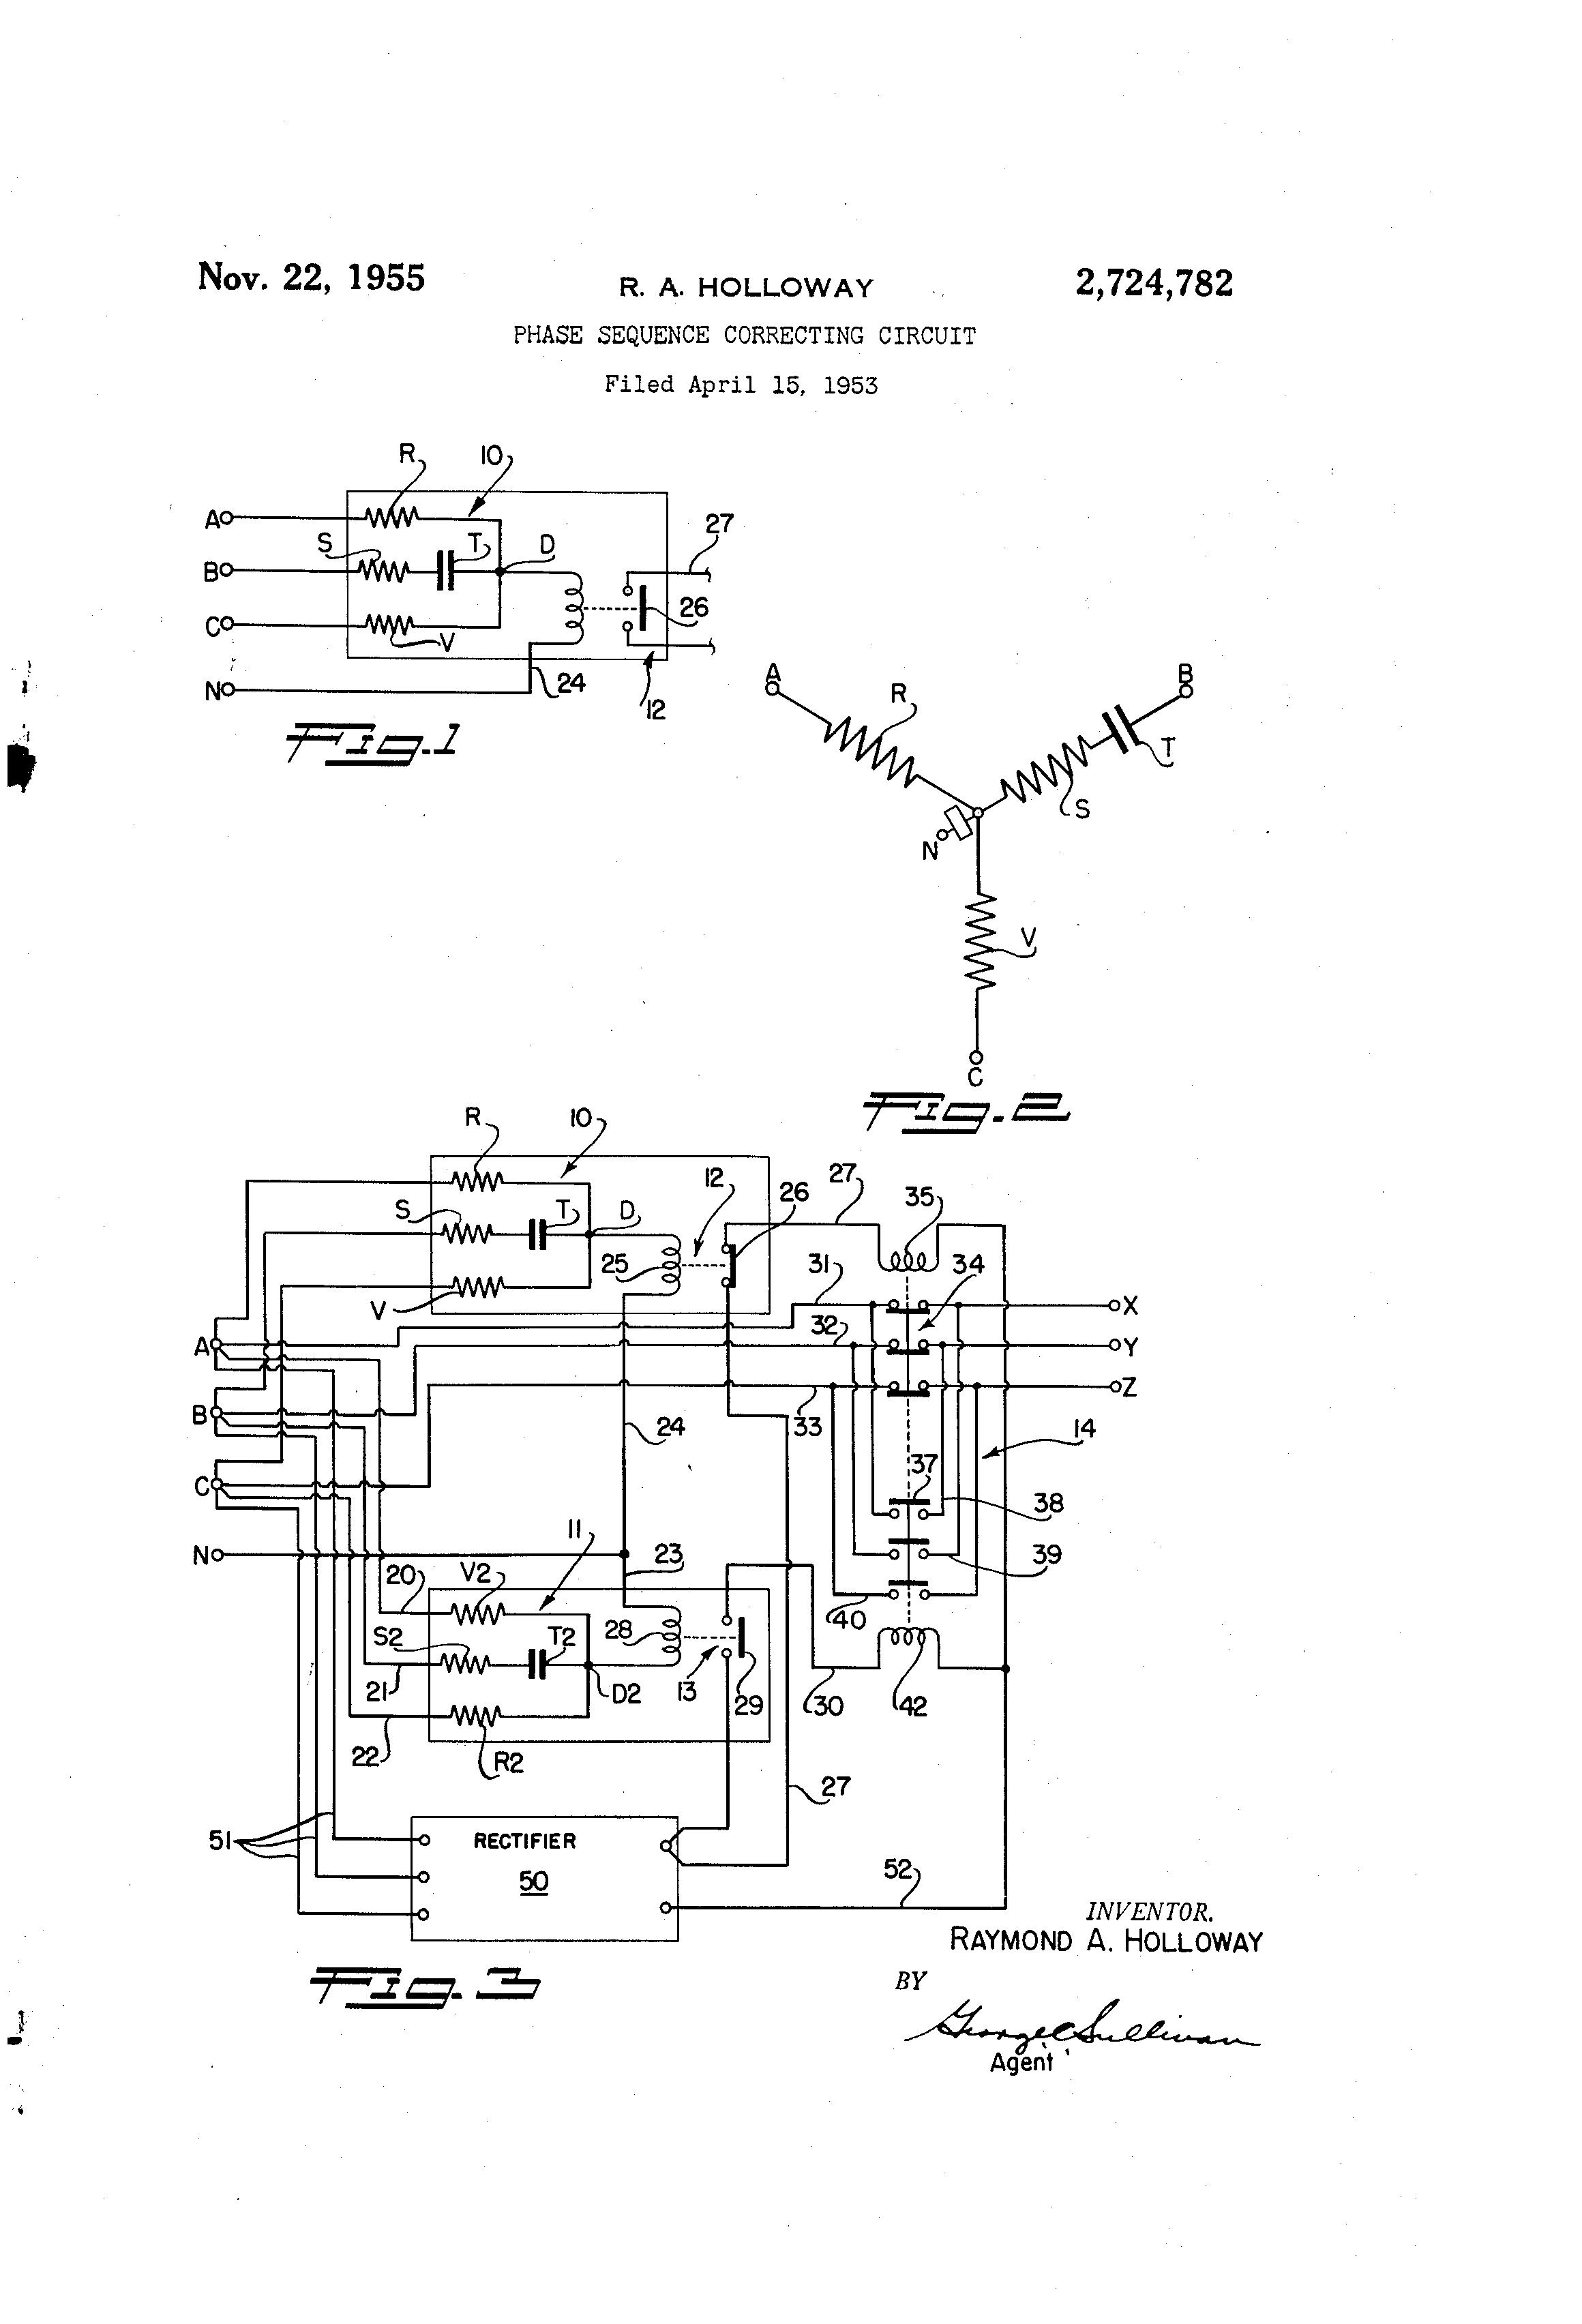 thermo king m19 3 wiring diagram wiring diagram and schematics Jet Boat Ultranautics Sea Flash